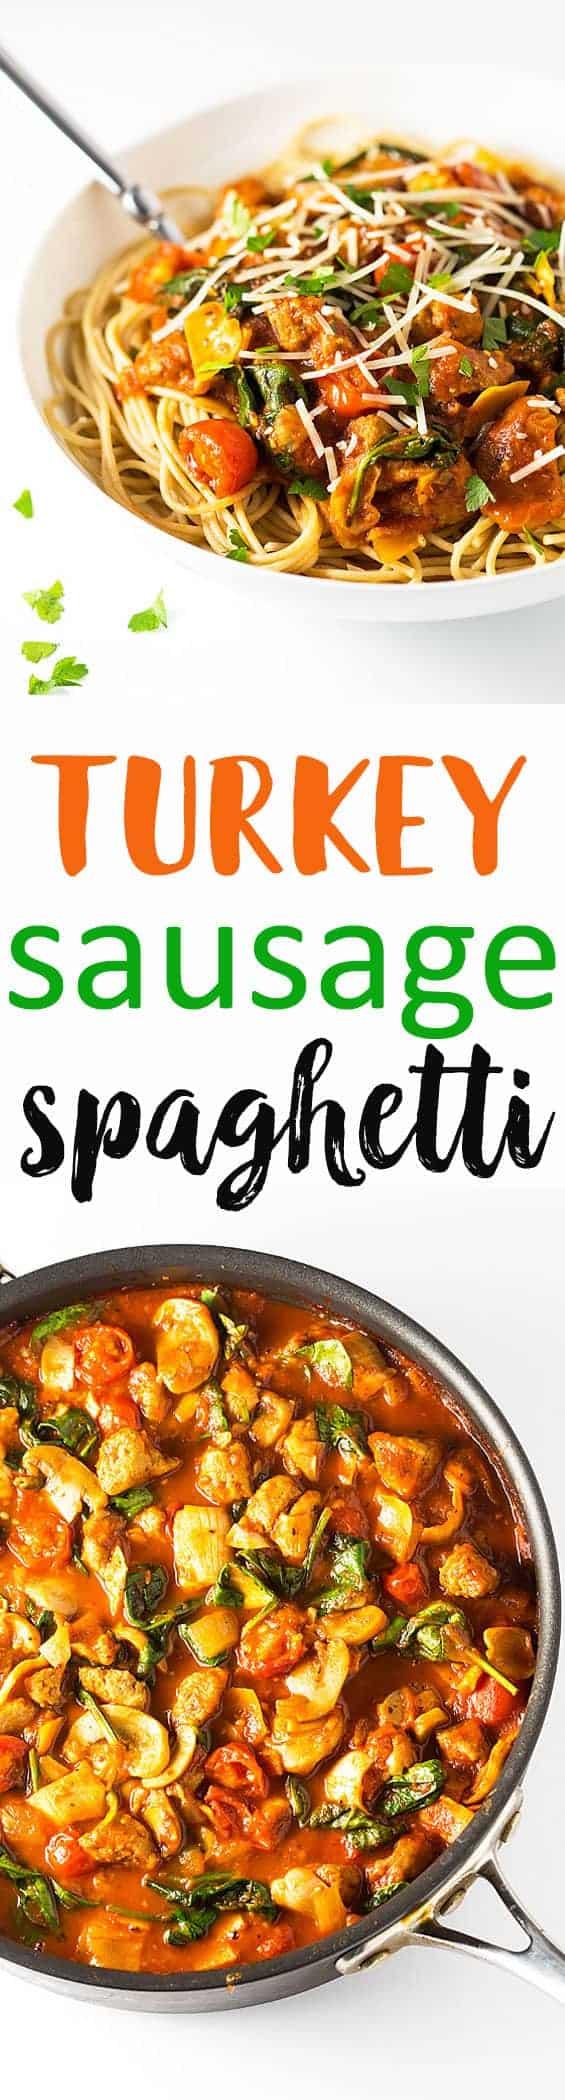 Turkey Sausage Spaghetti - A healthier spaghetti recipe with Italian turkey sausage, mushrooms, artichoke hearts and spinach served over whole wheat spaghetti noodles.